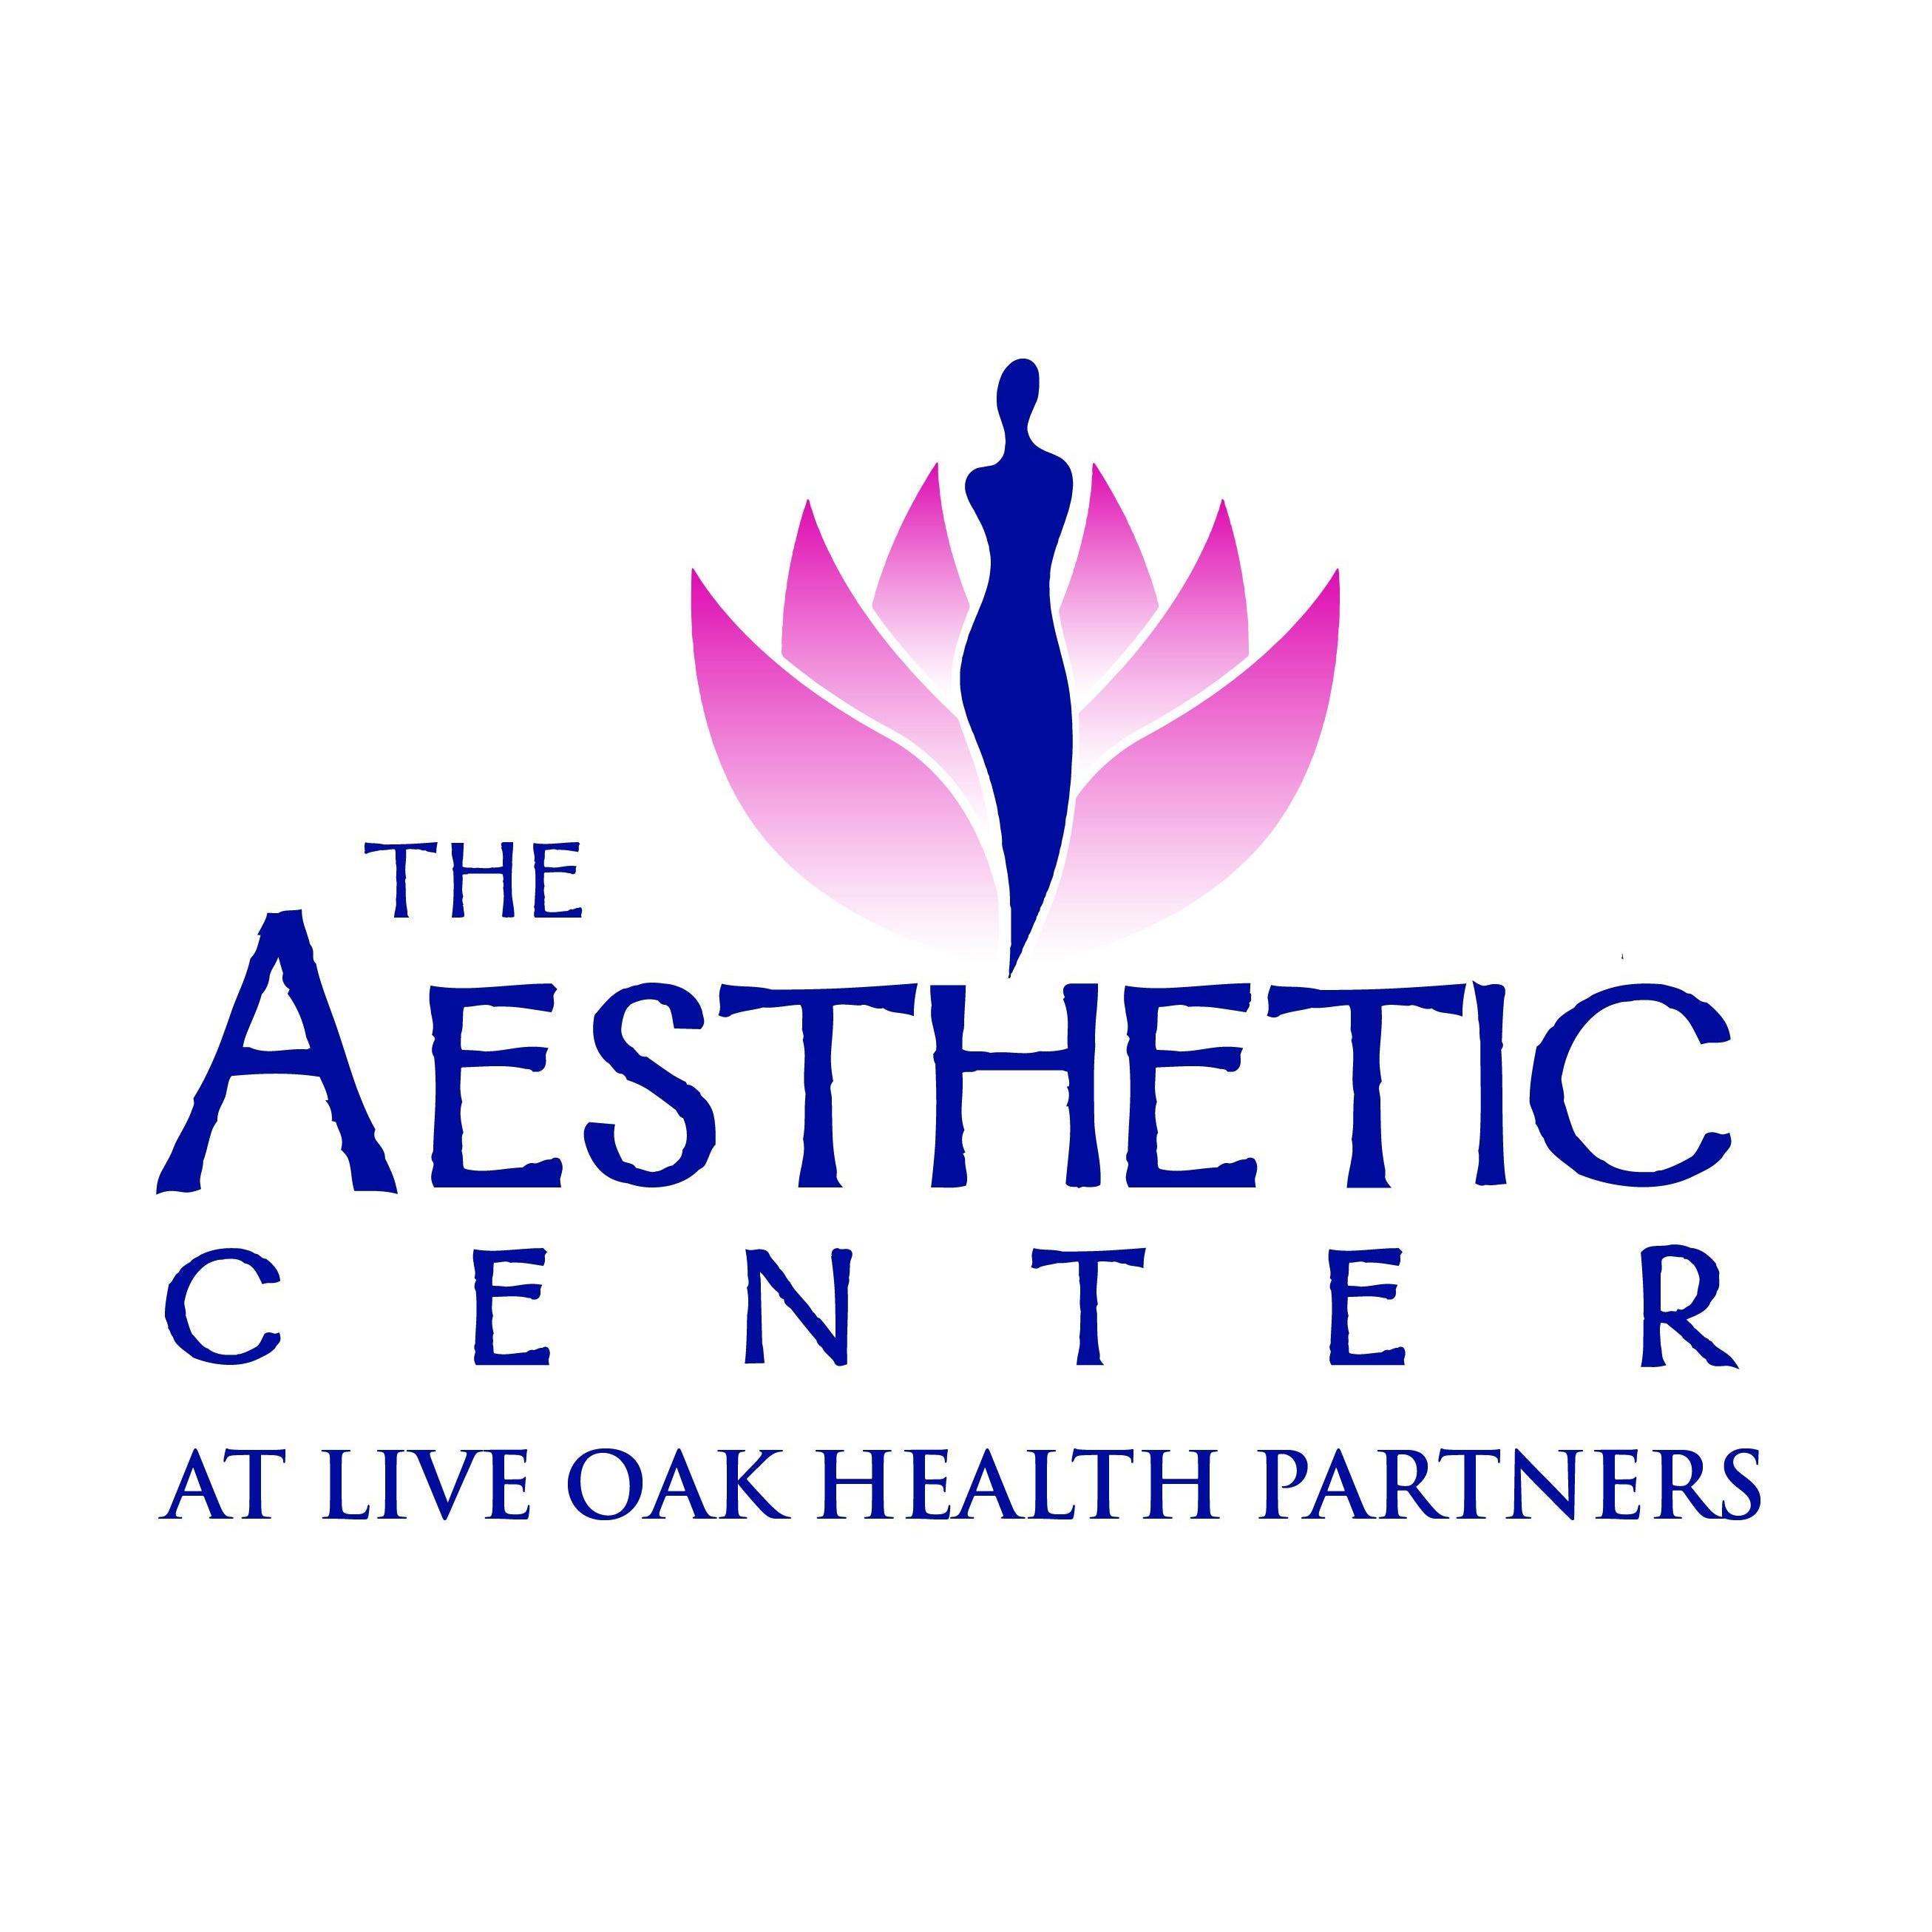 The Aesthetics Center at Live Oak Health Partners